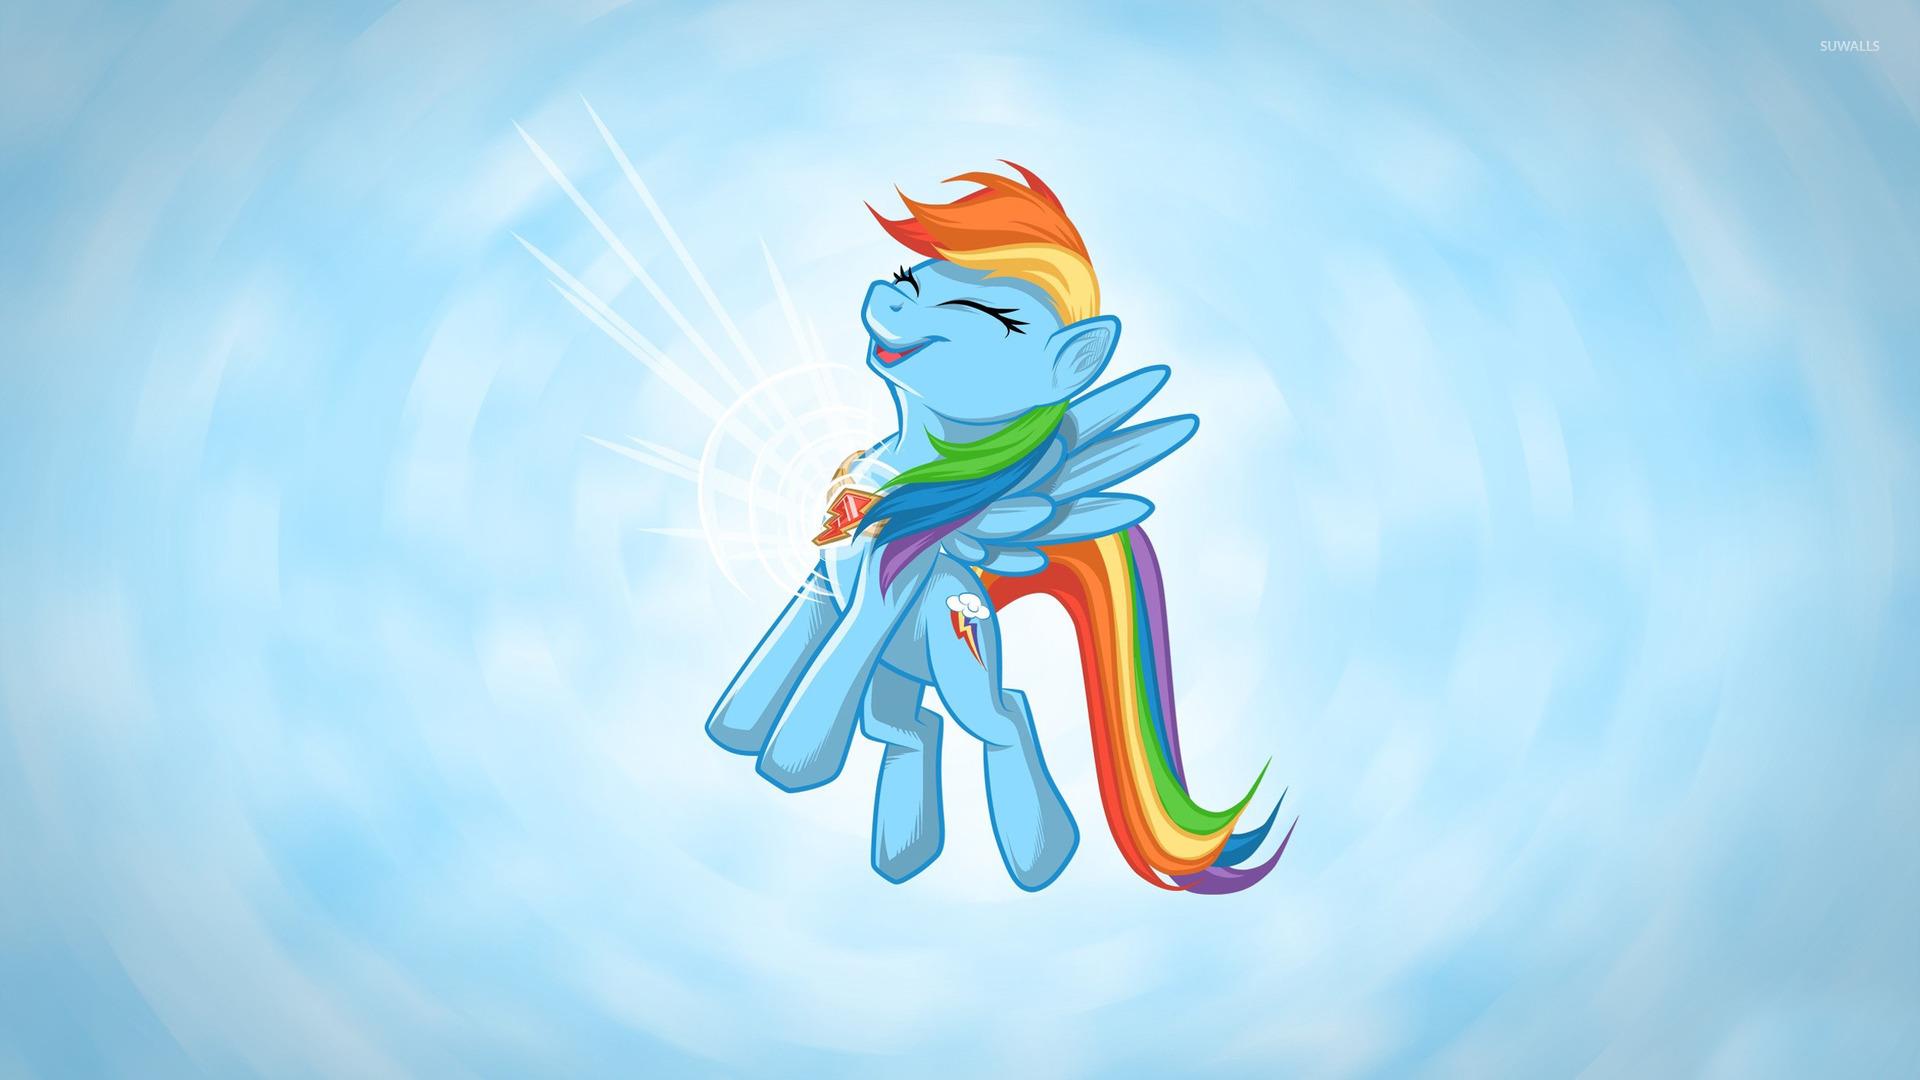 Animated Rainbow Dash Wallpaper - WallpaperSafari